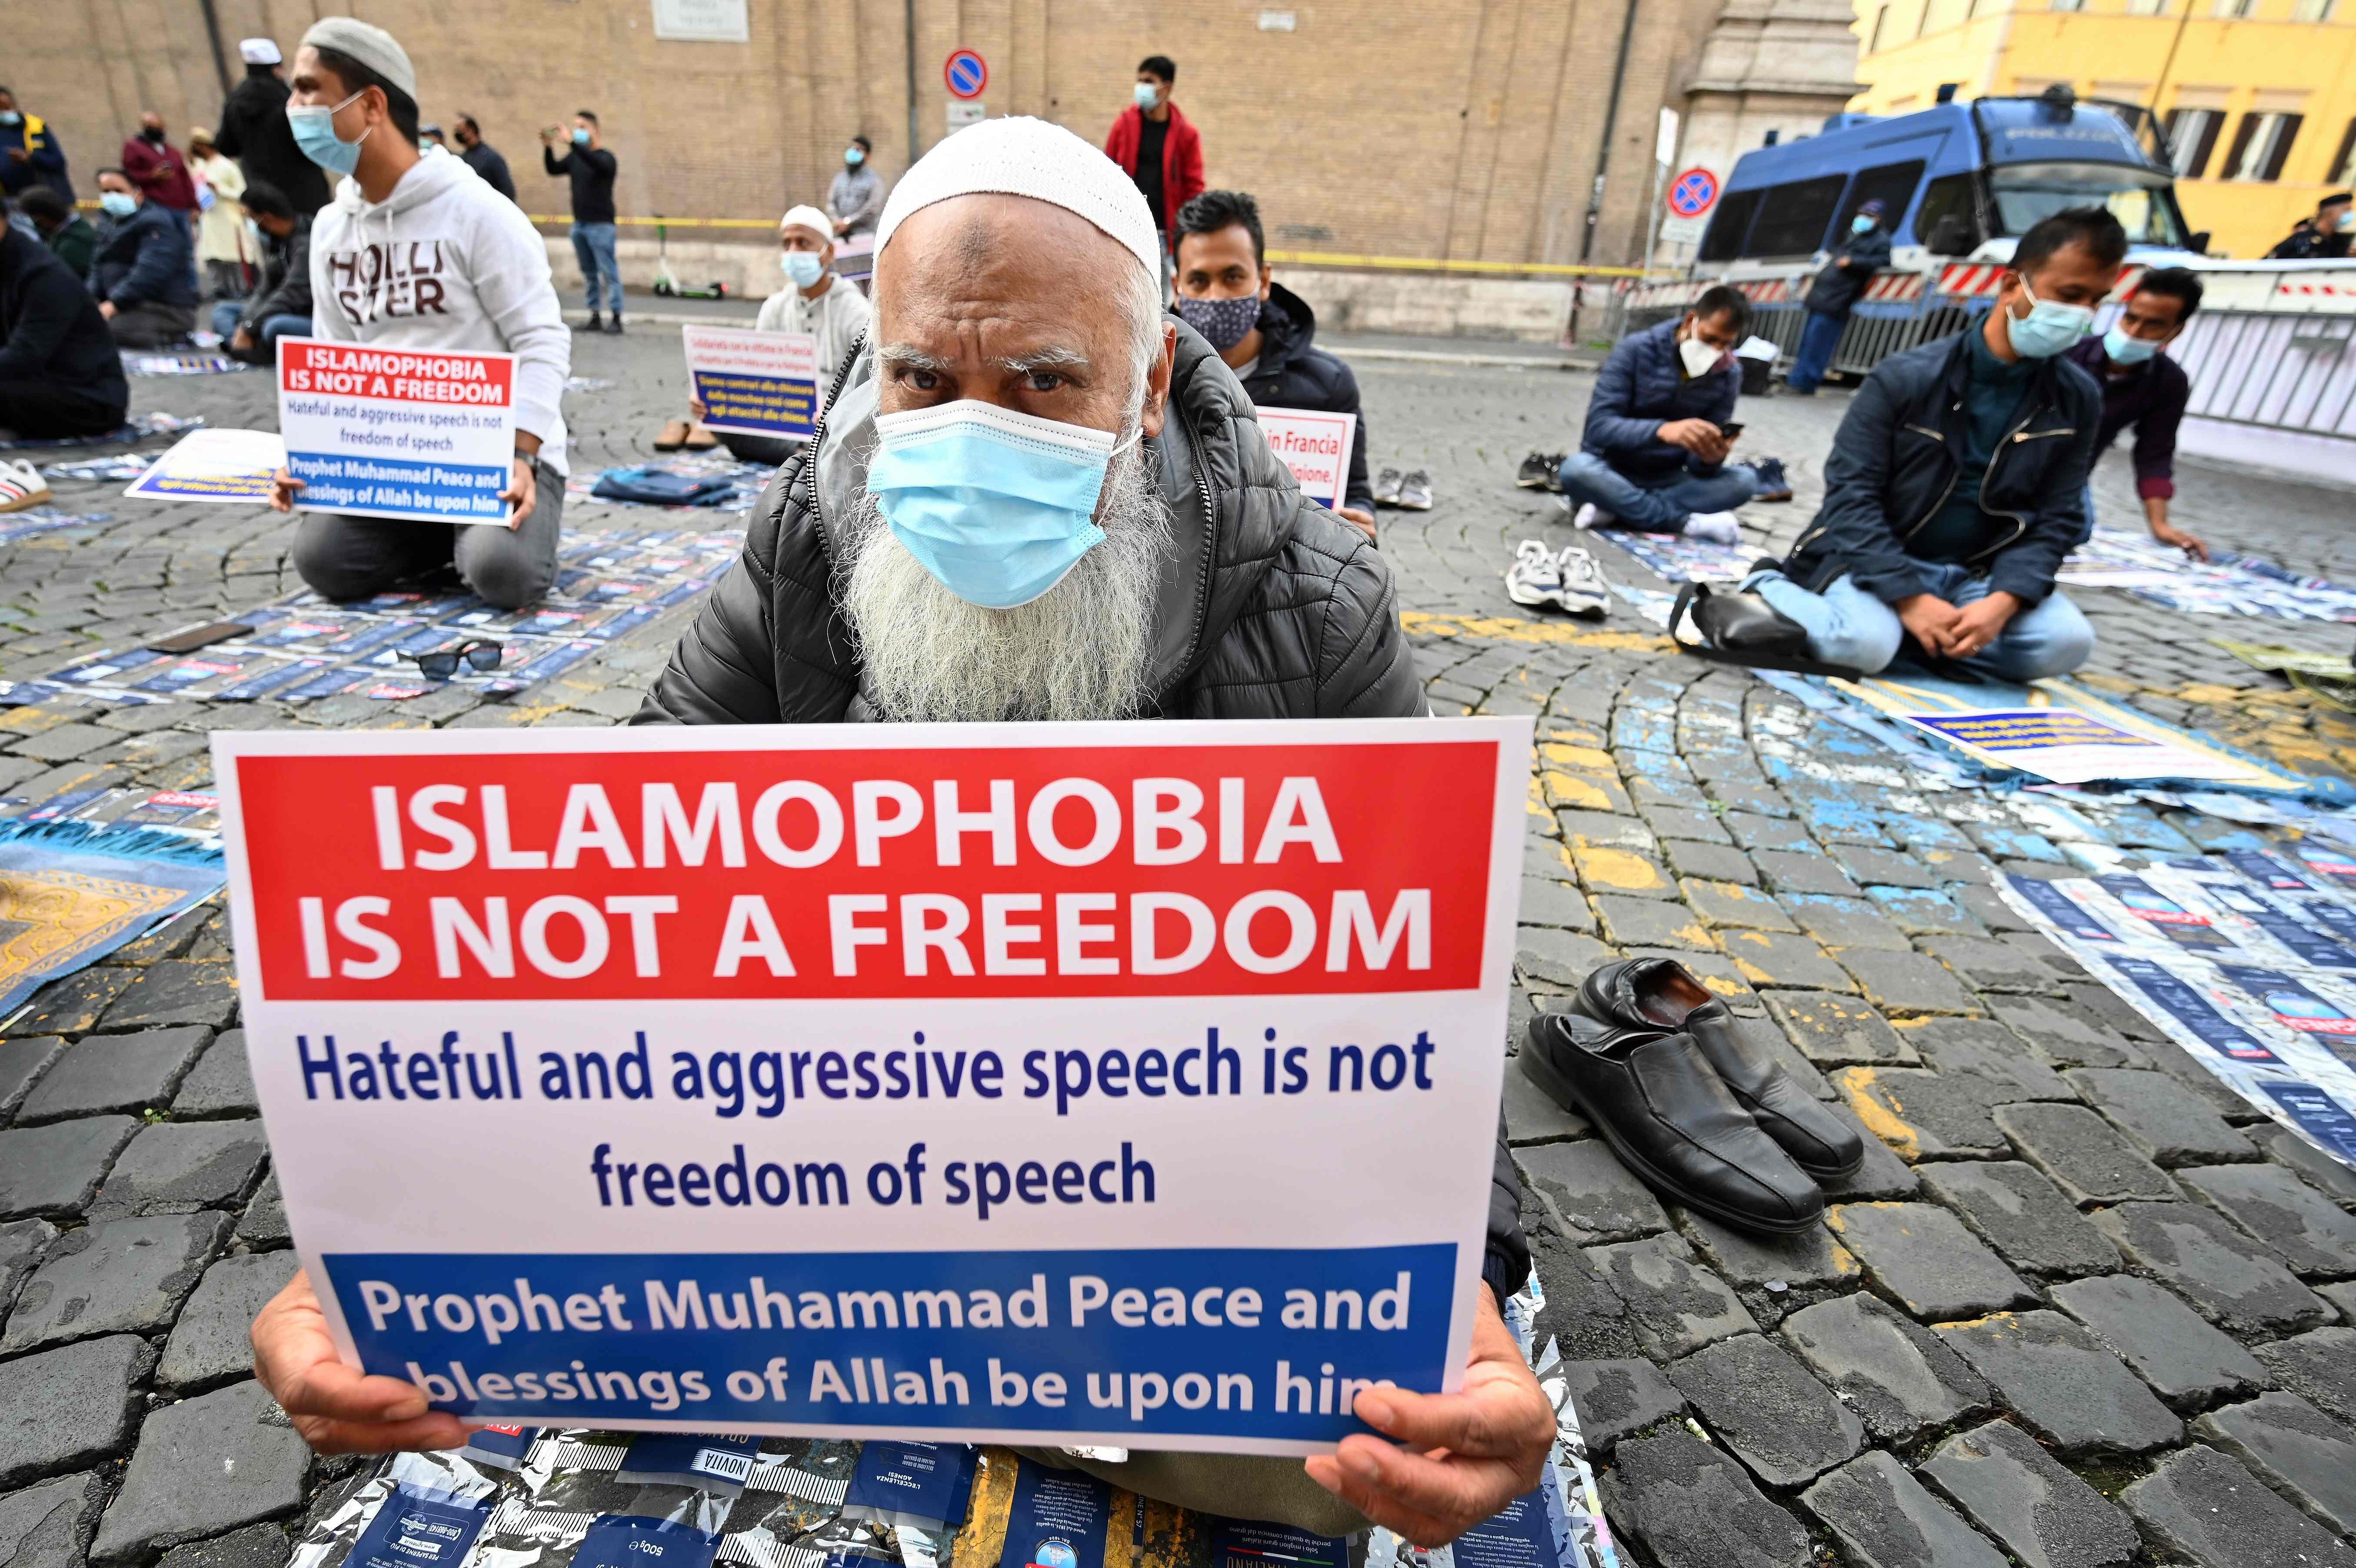 Terror attacks in France over Mohammad cartoons spark debate on secularism, Islamophobia